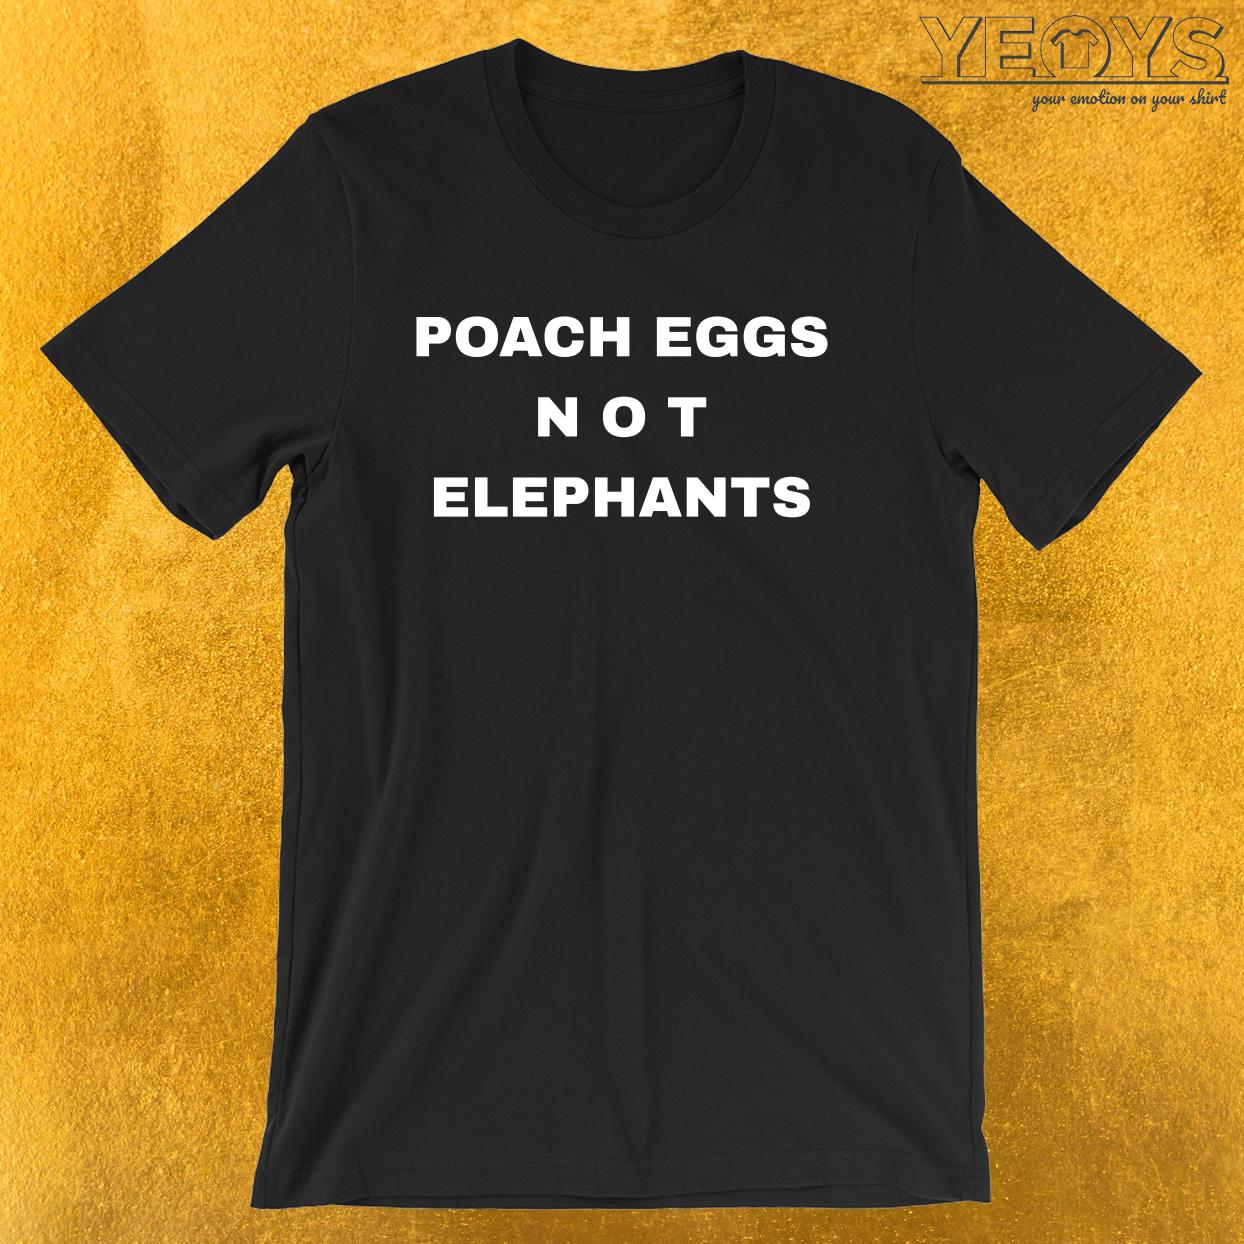 Poach Eggs Not Elephants – Stop Poaching Tee